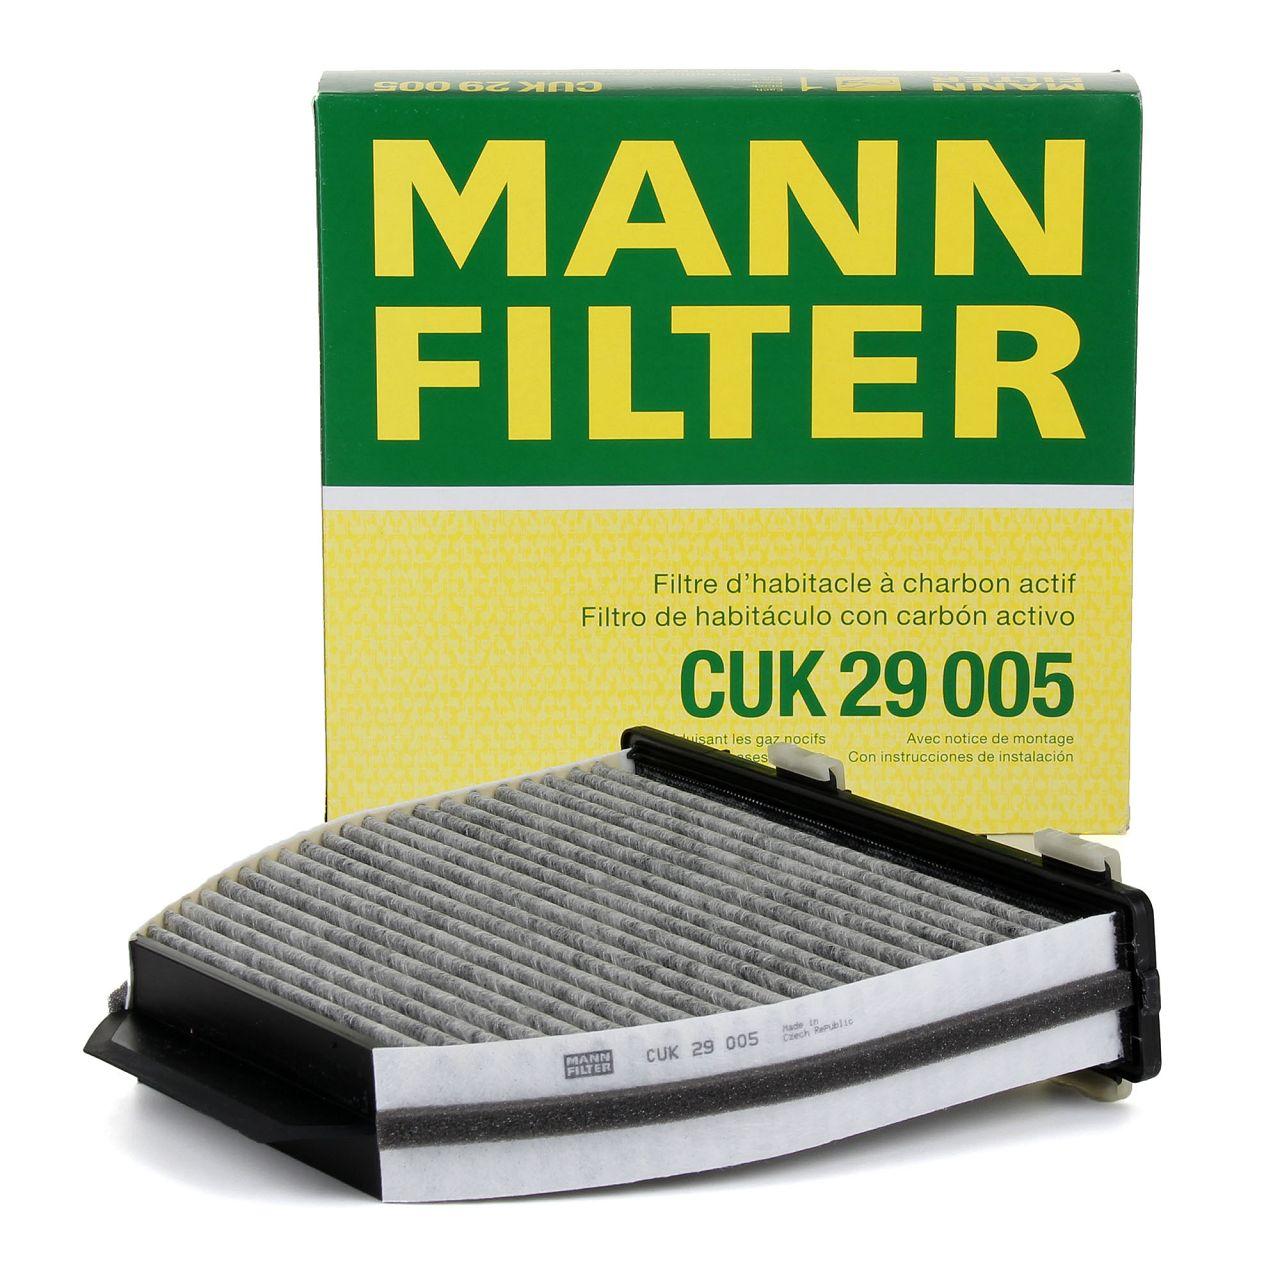 MANN Innenraumfilter Aktivkohlefilter CUK29005 für MERCEDES W204 W212 X204 R231